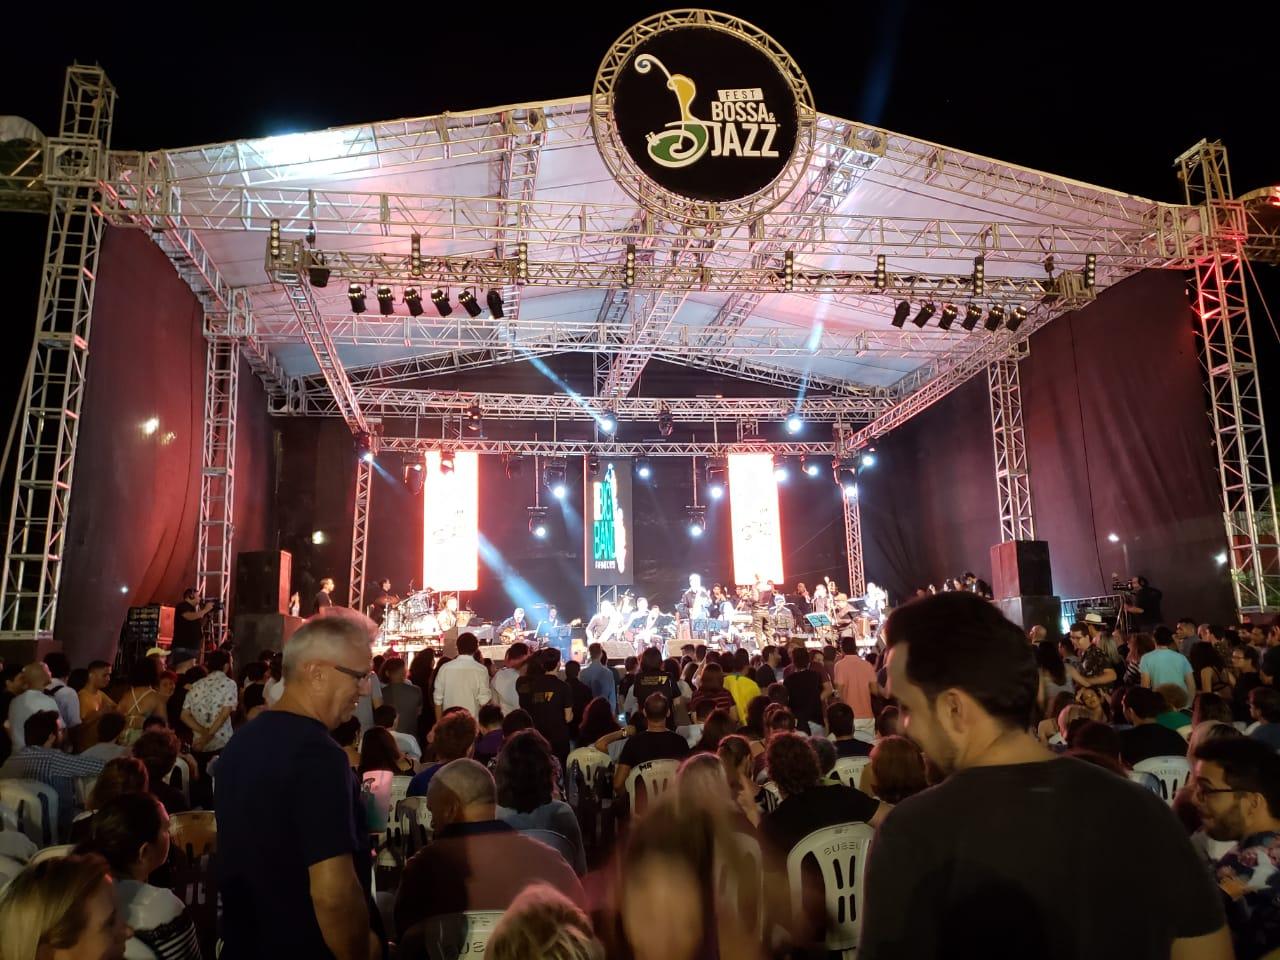 Fest Bossa & Jazz chega a Praia da Pipa dia 13 de dezembro